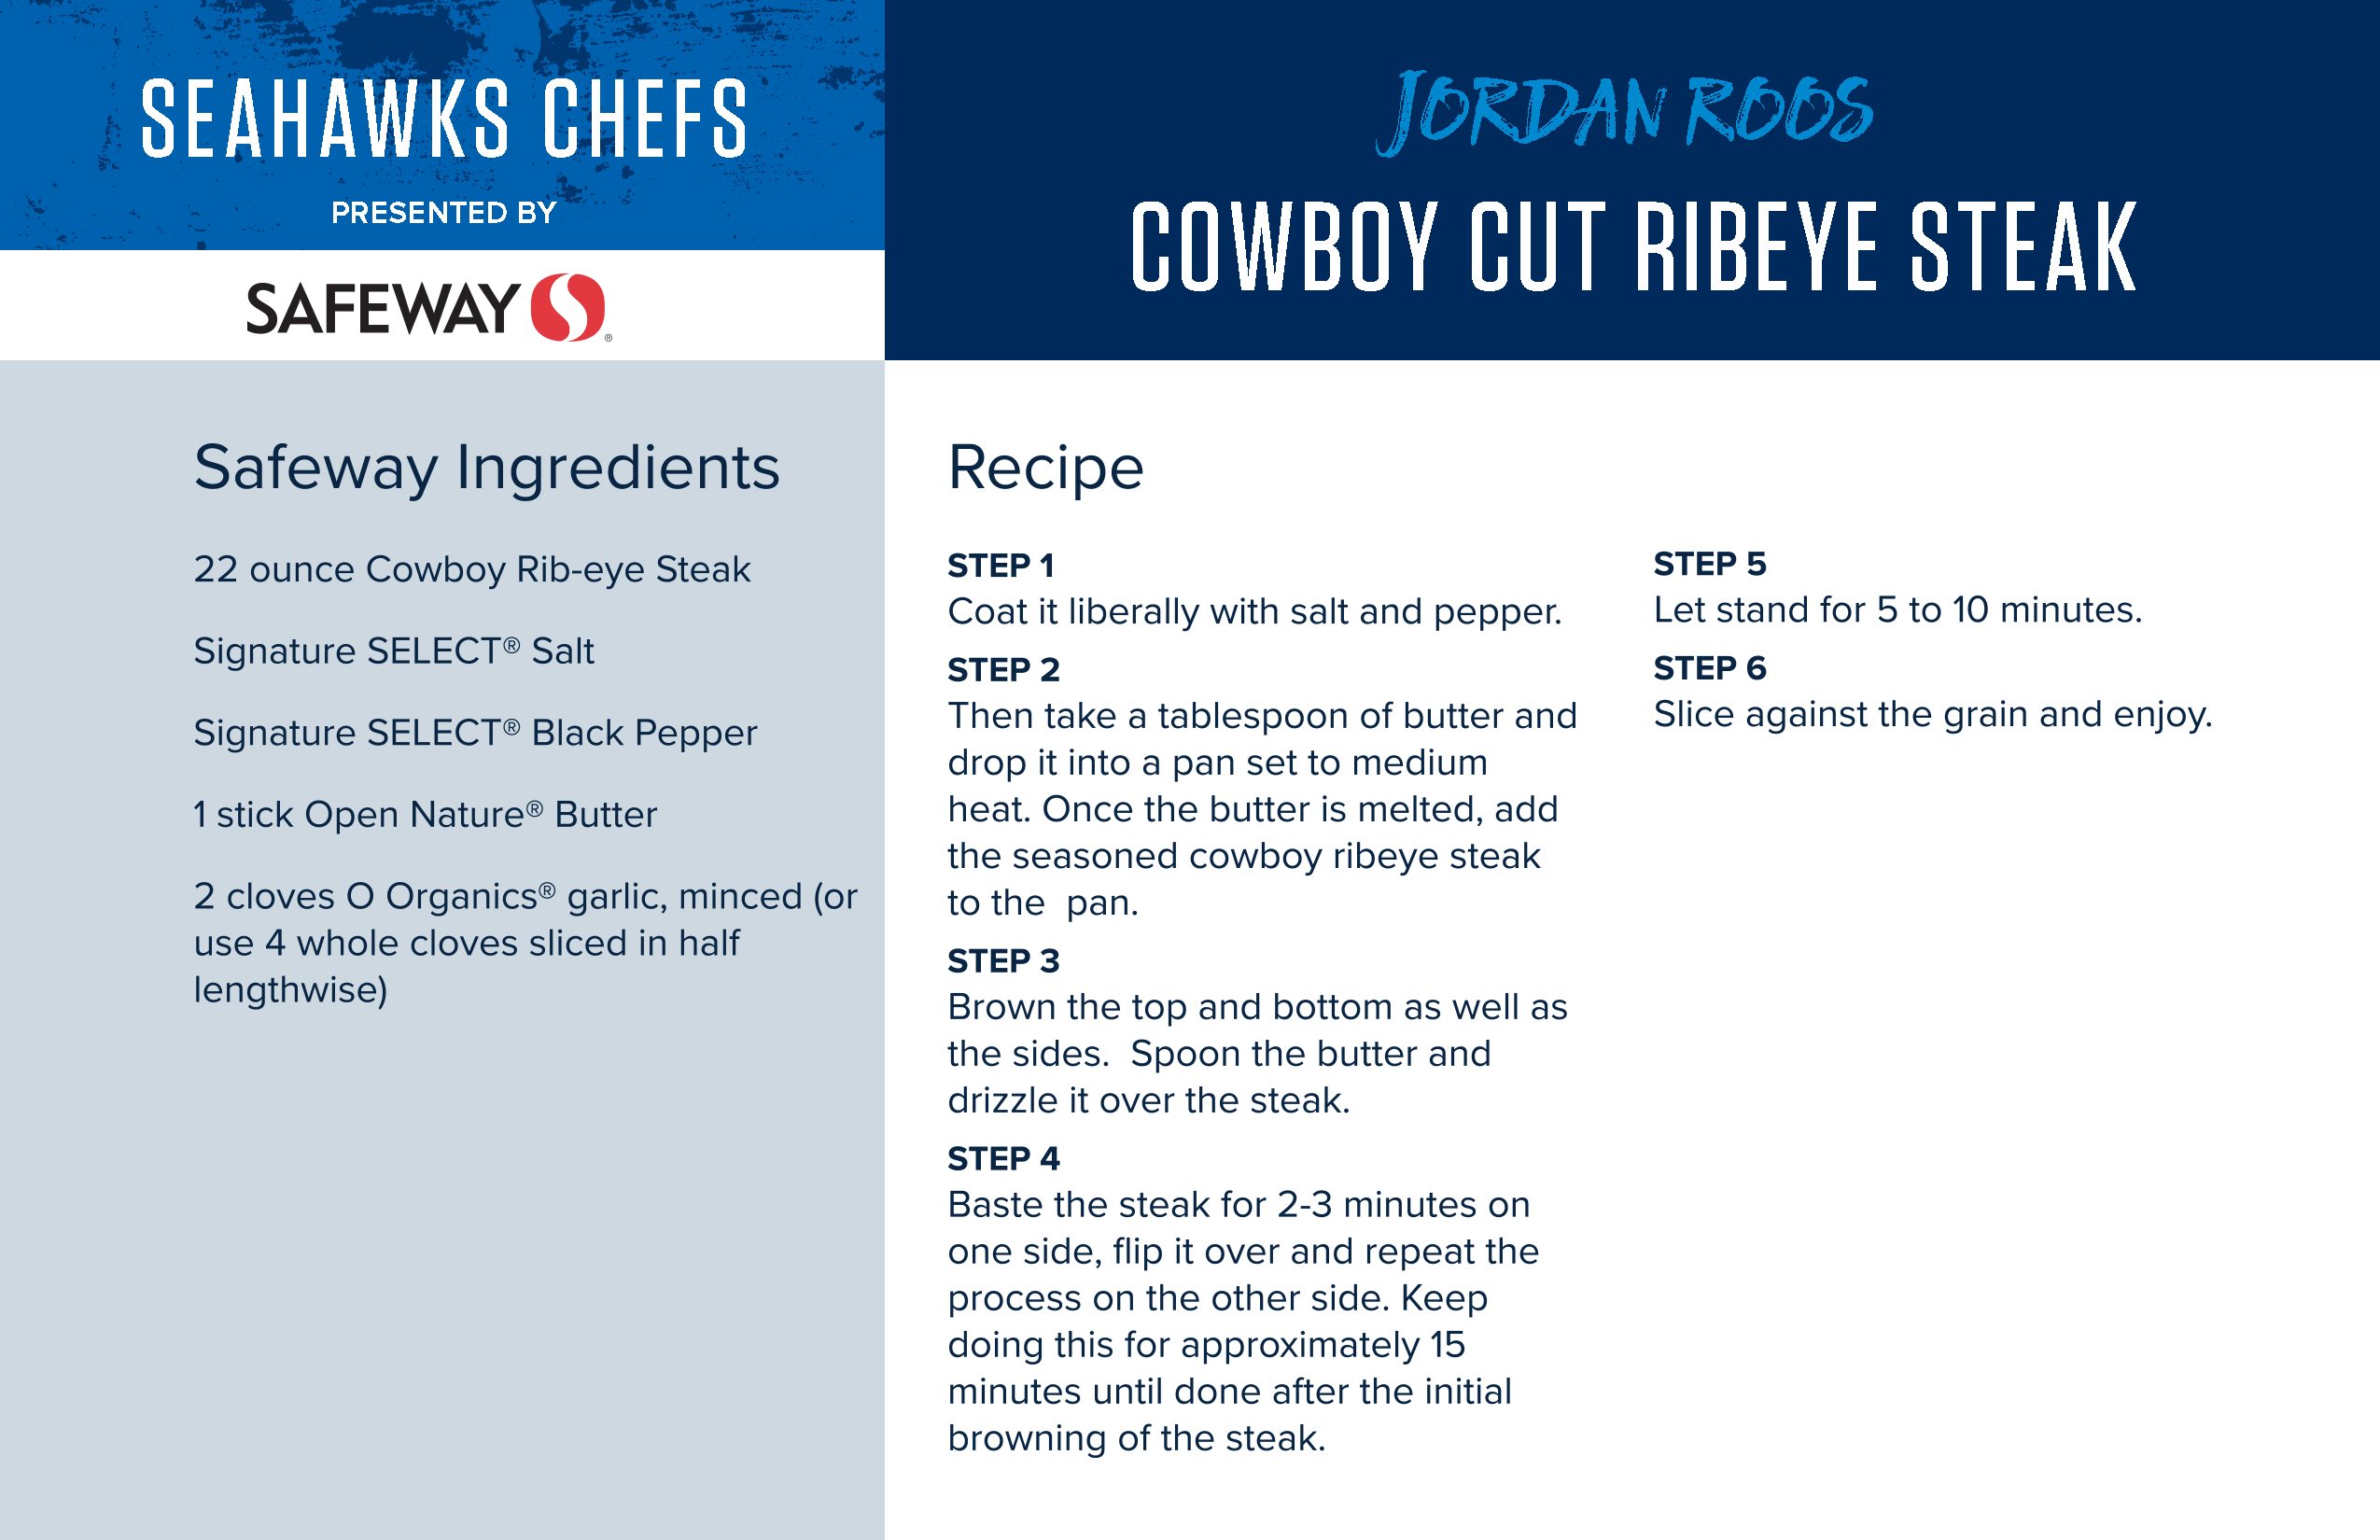 Seahawks Chefs_Jordan Roos-RecipeCard